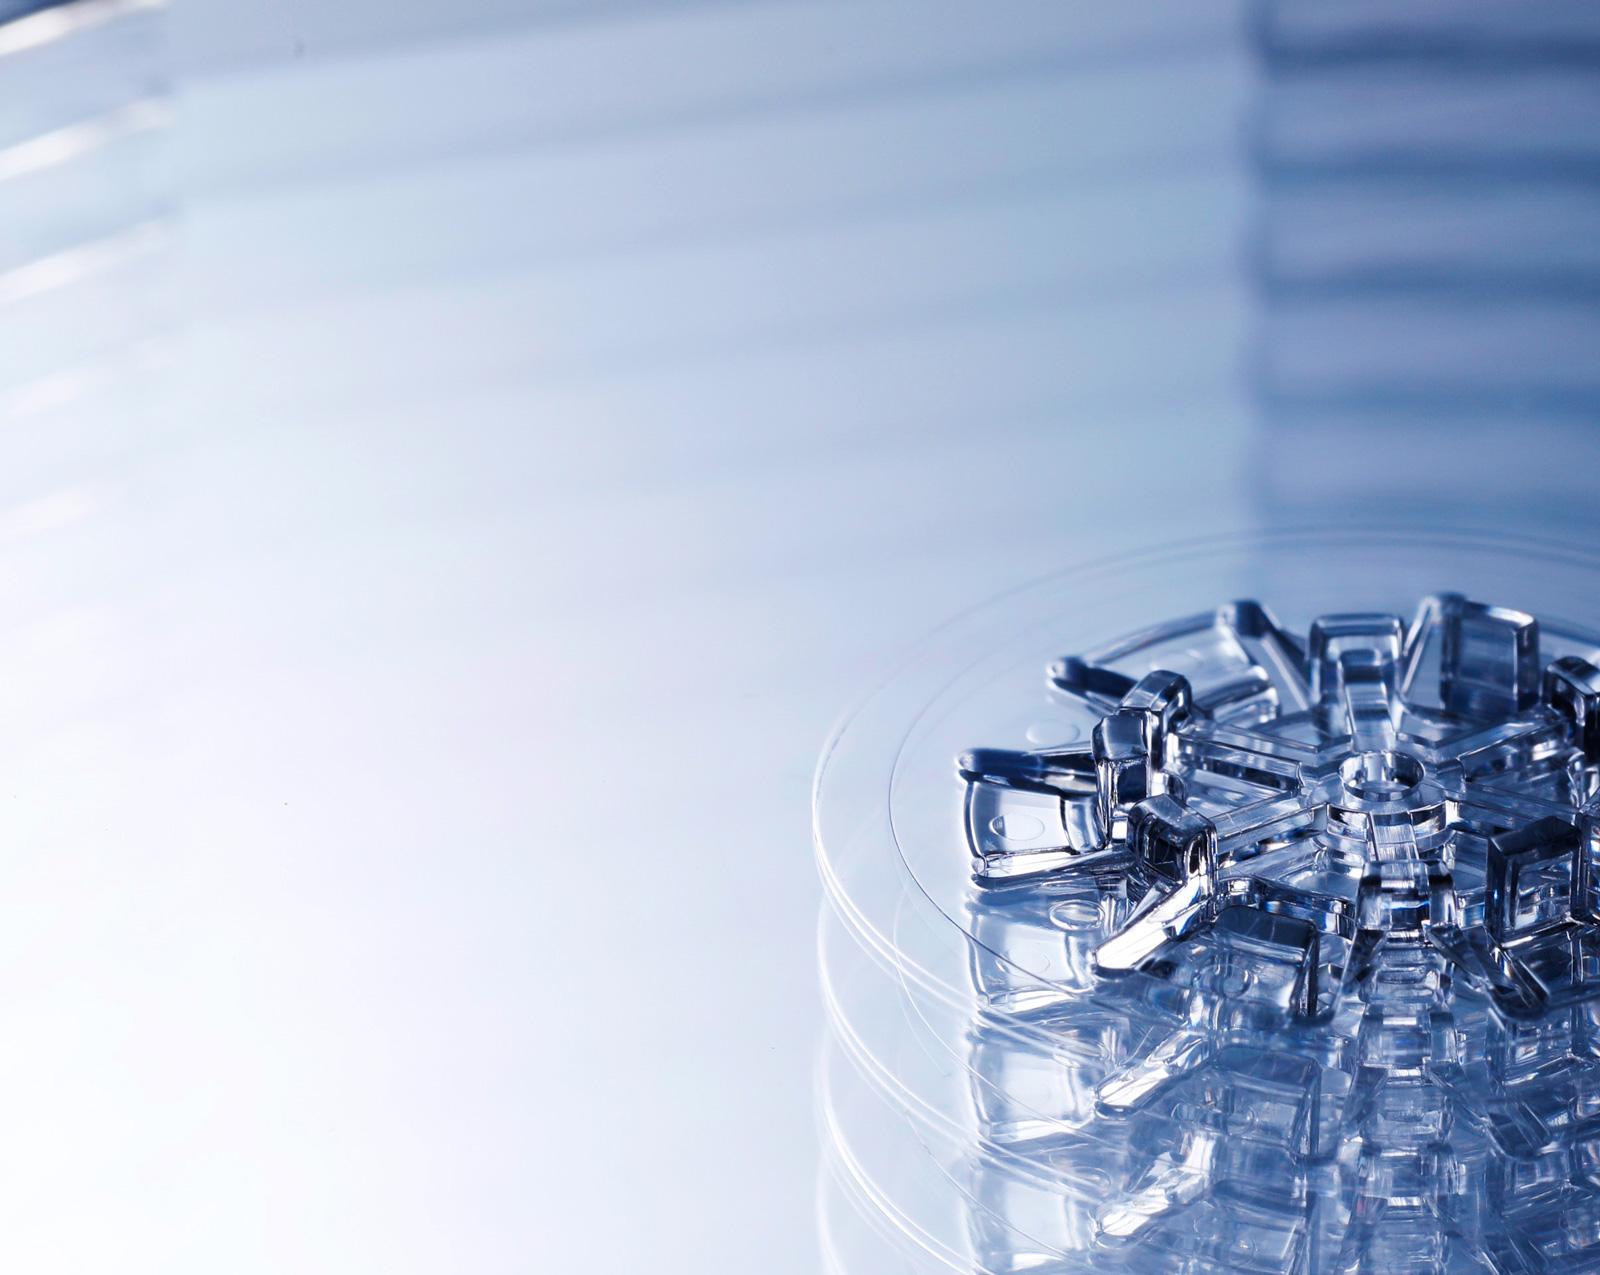 PLASTIC IS BEAUTIFUL プラスチックの特性と可能性